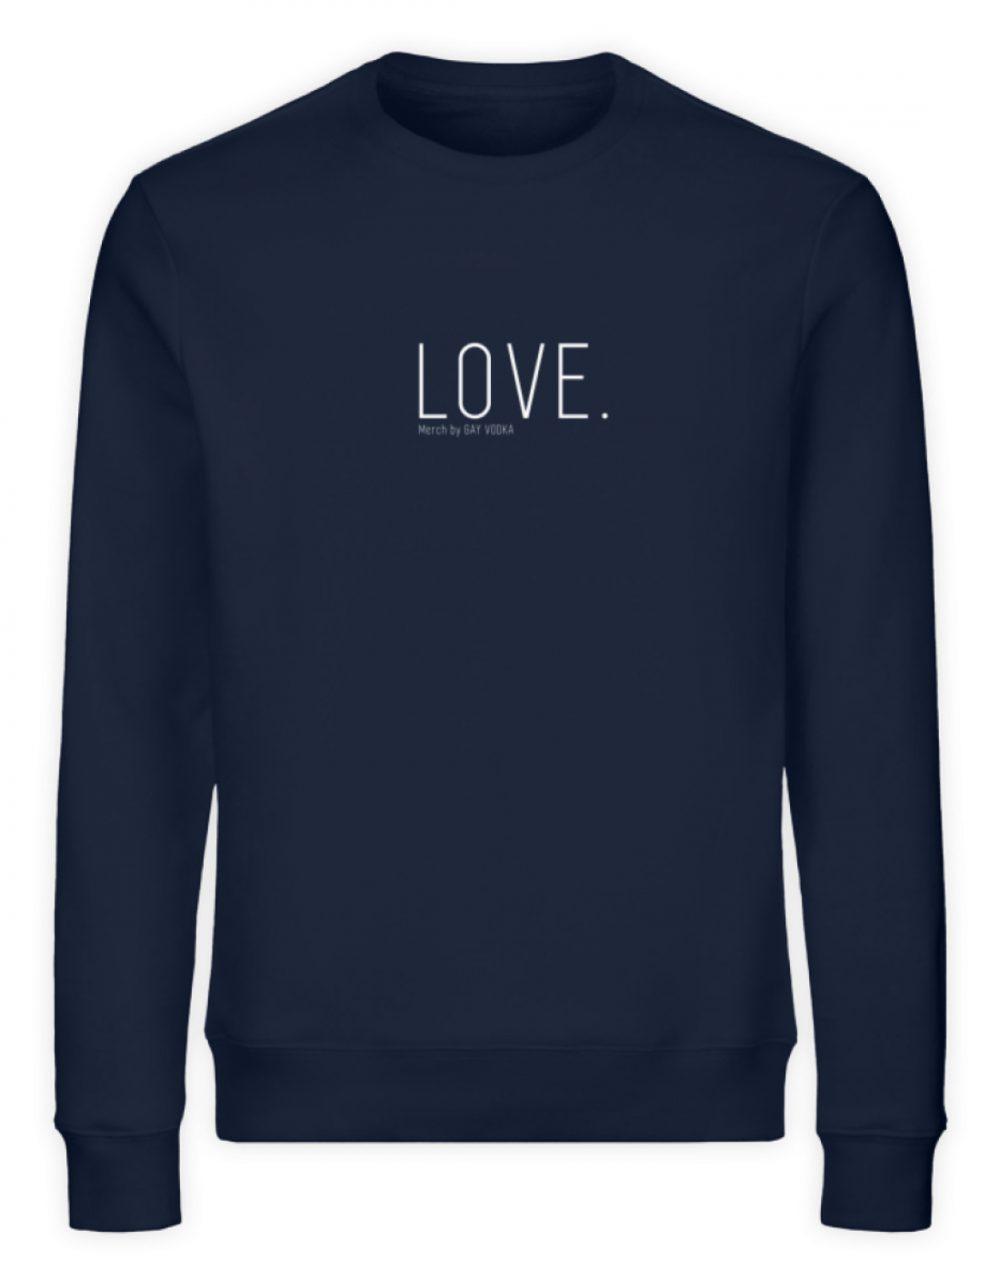 LOVE. - Unisex Organic Sweatshirt-6887